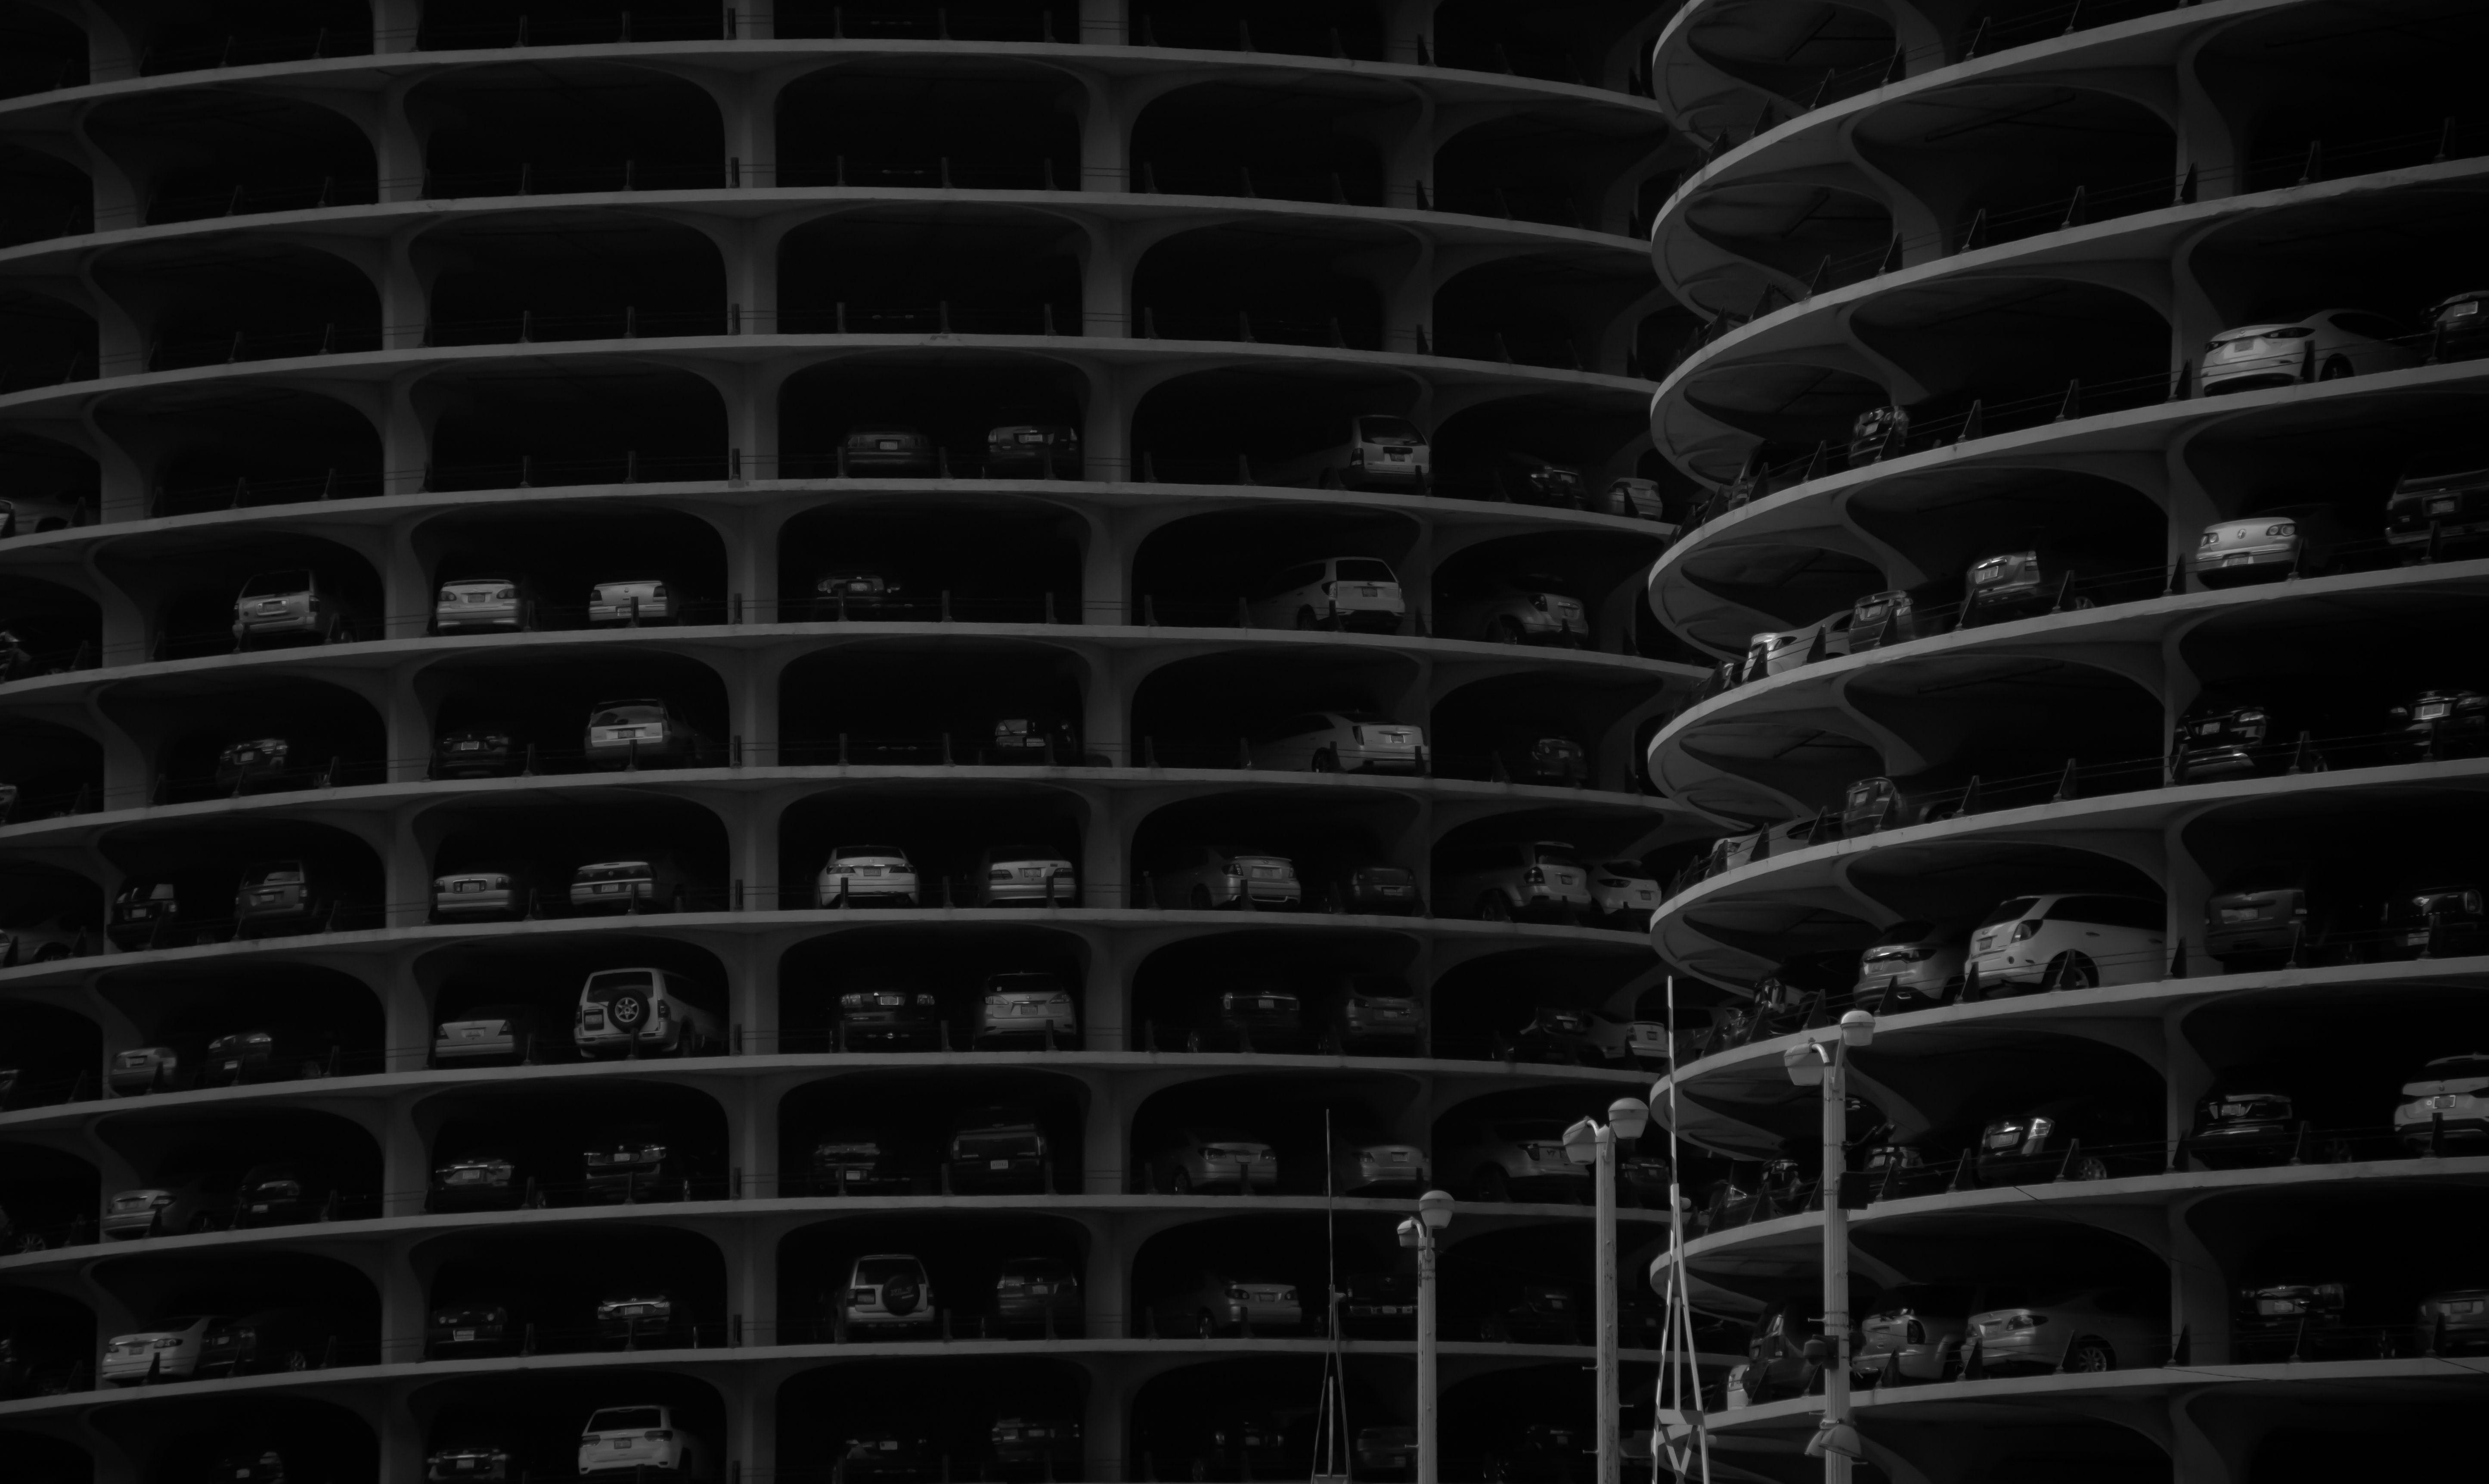 Twin Corn Cob Buildings/Marina City #Chicago